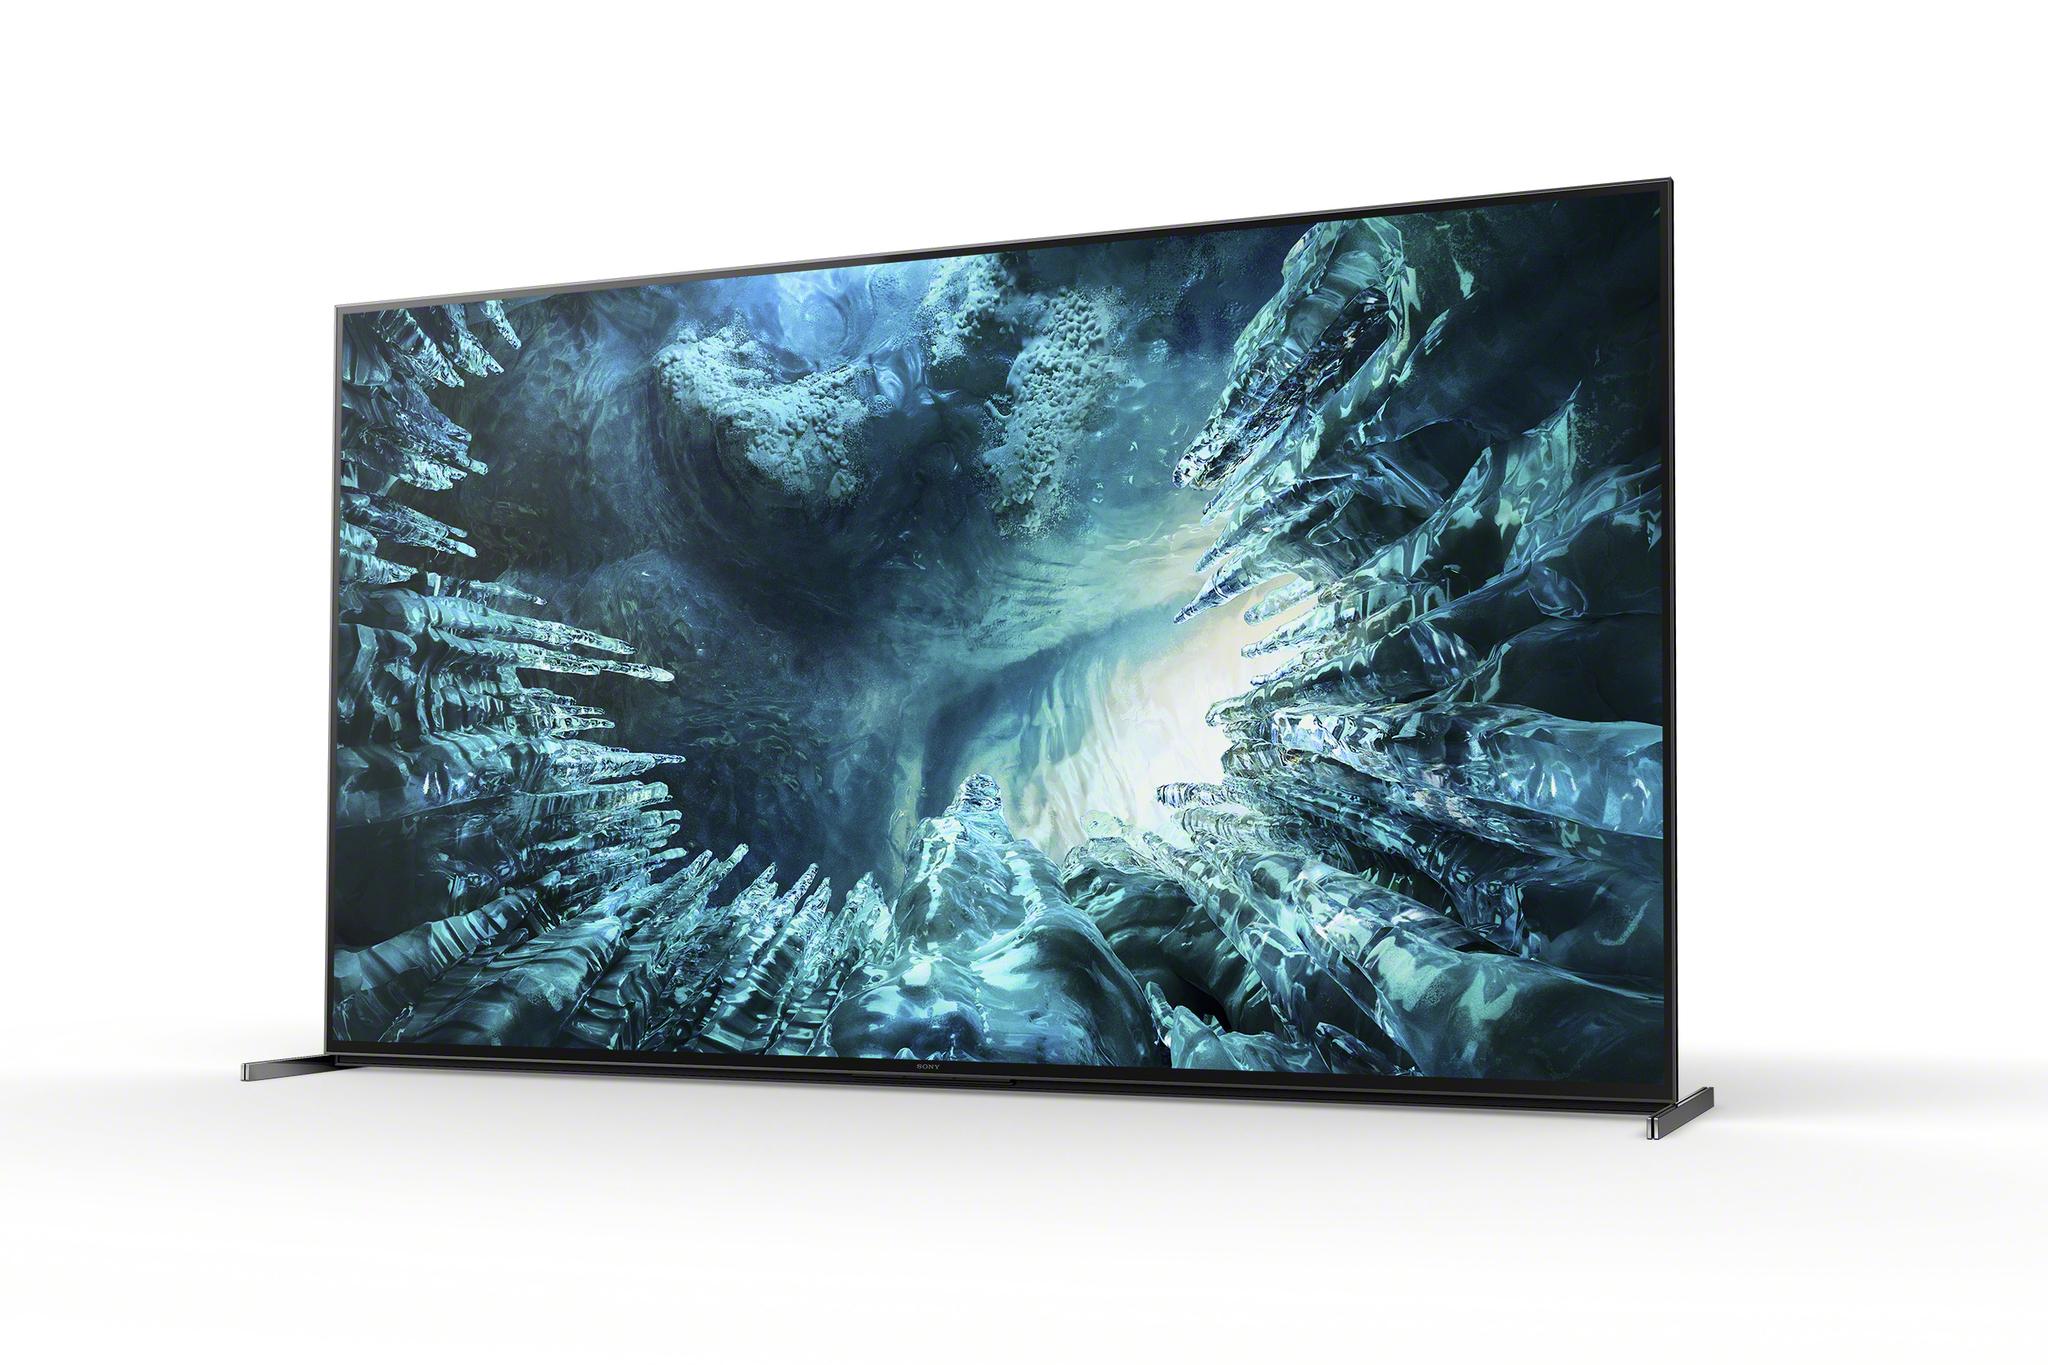 8K телевизор Sony KD-85ZH8 купить в Sony Centre Воронеж